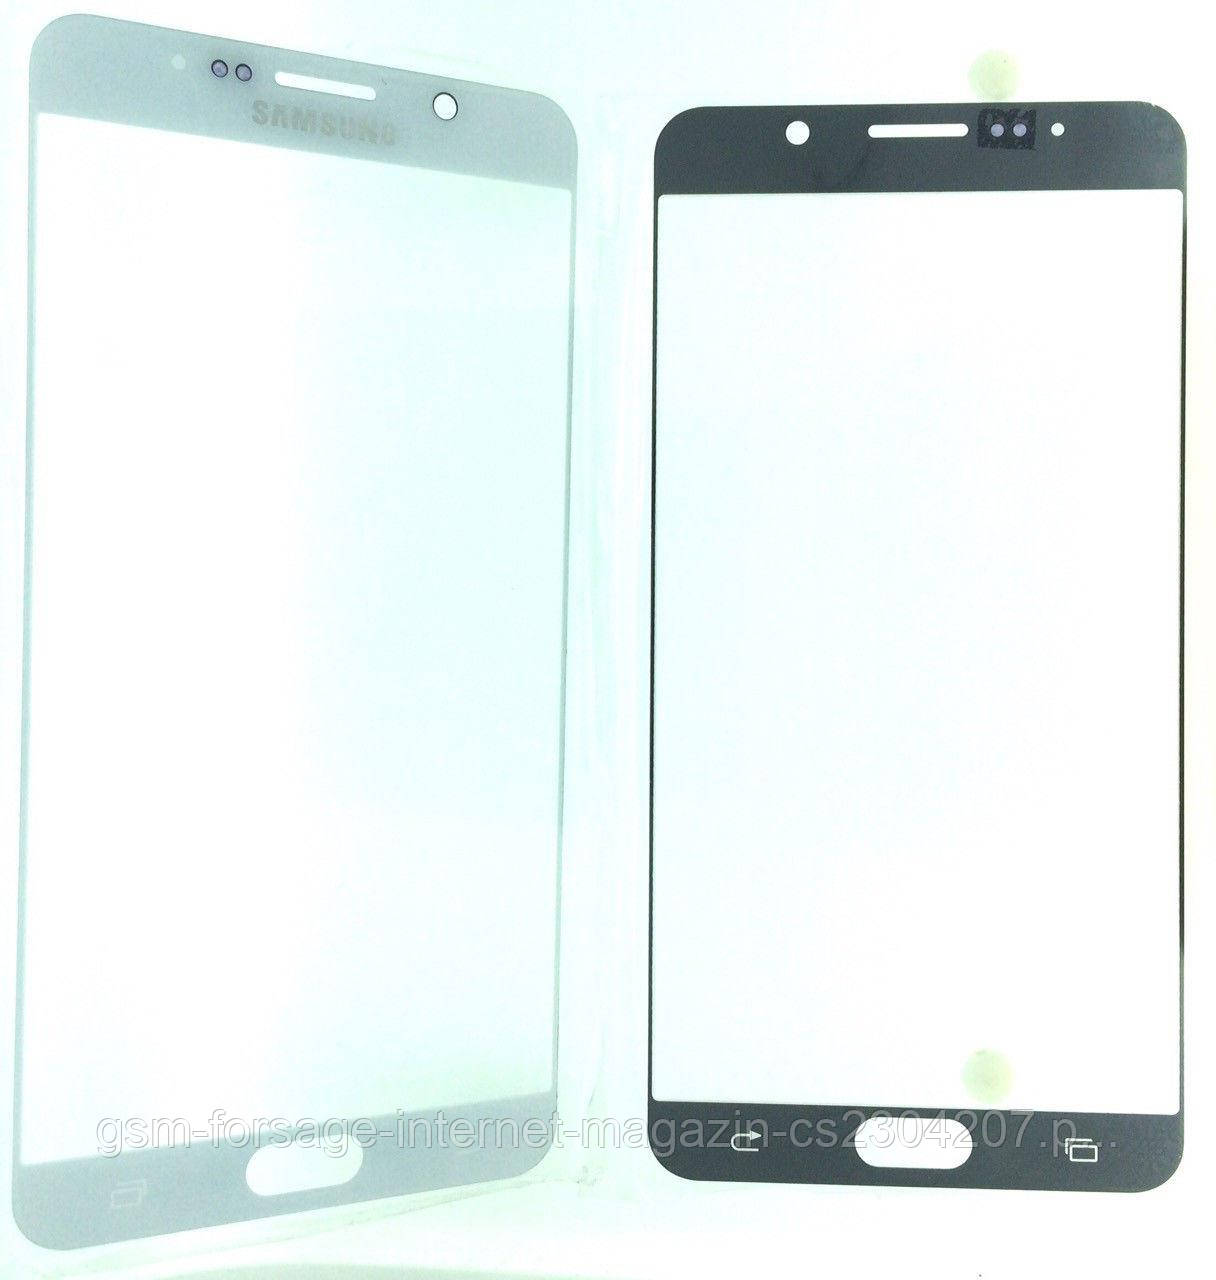 Стекло дисплея Samsung Note 5 White (для переклейки)